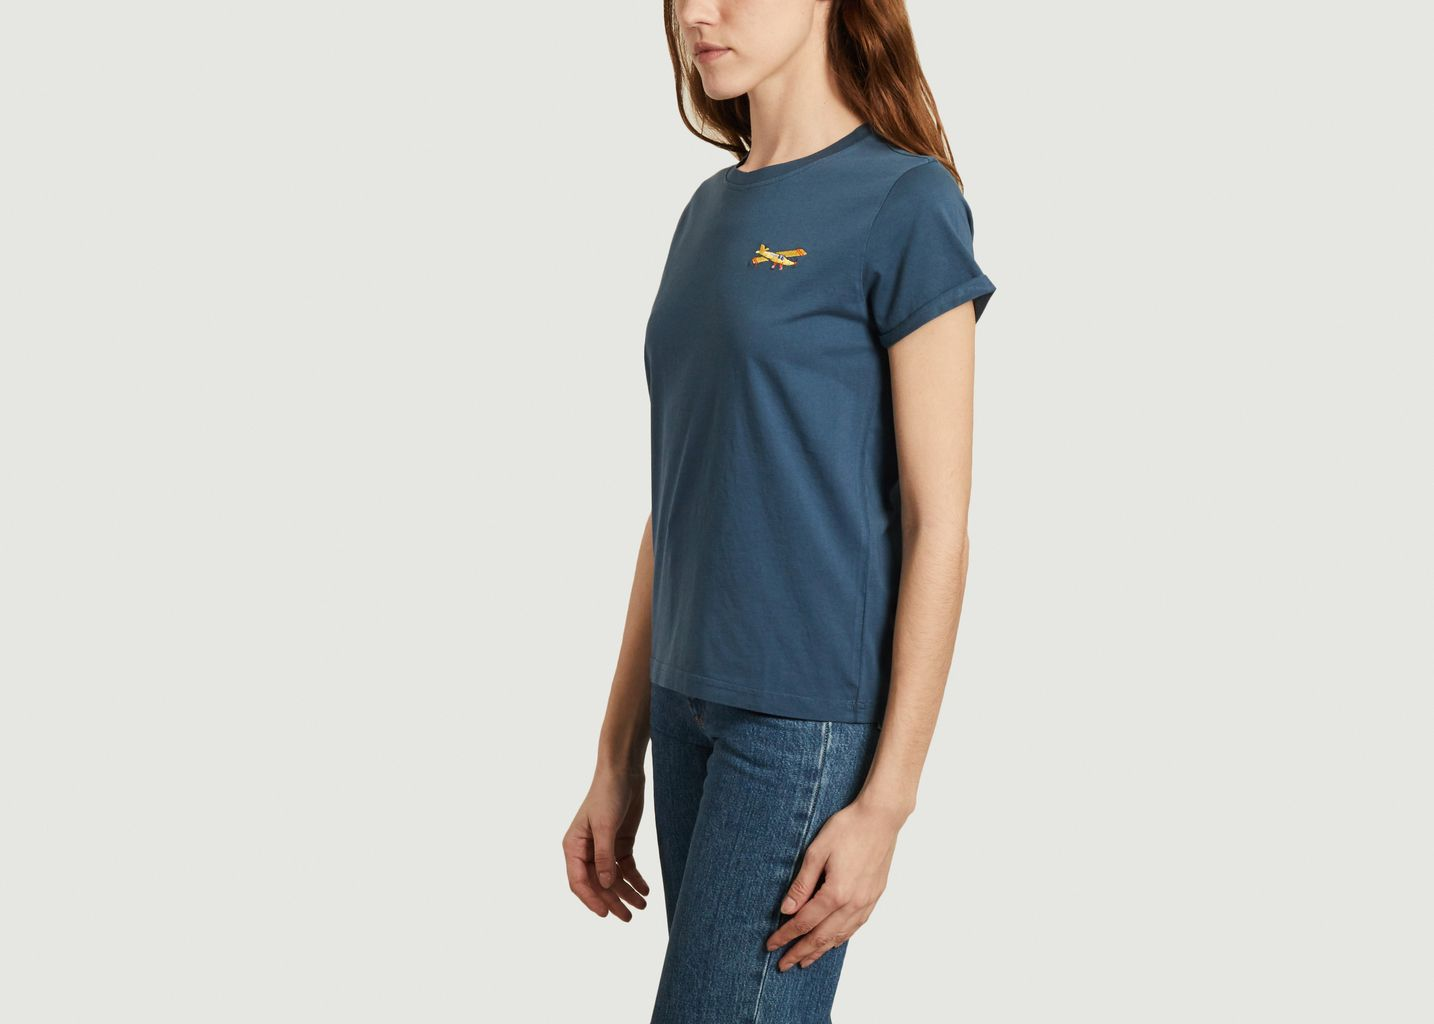 T-shirt Landing - Olow